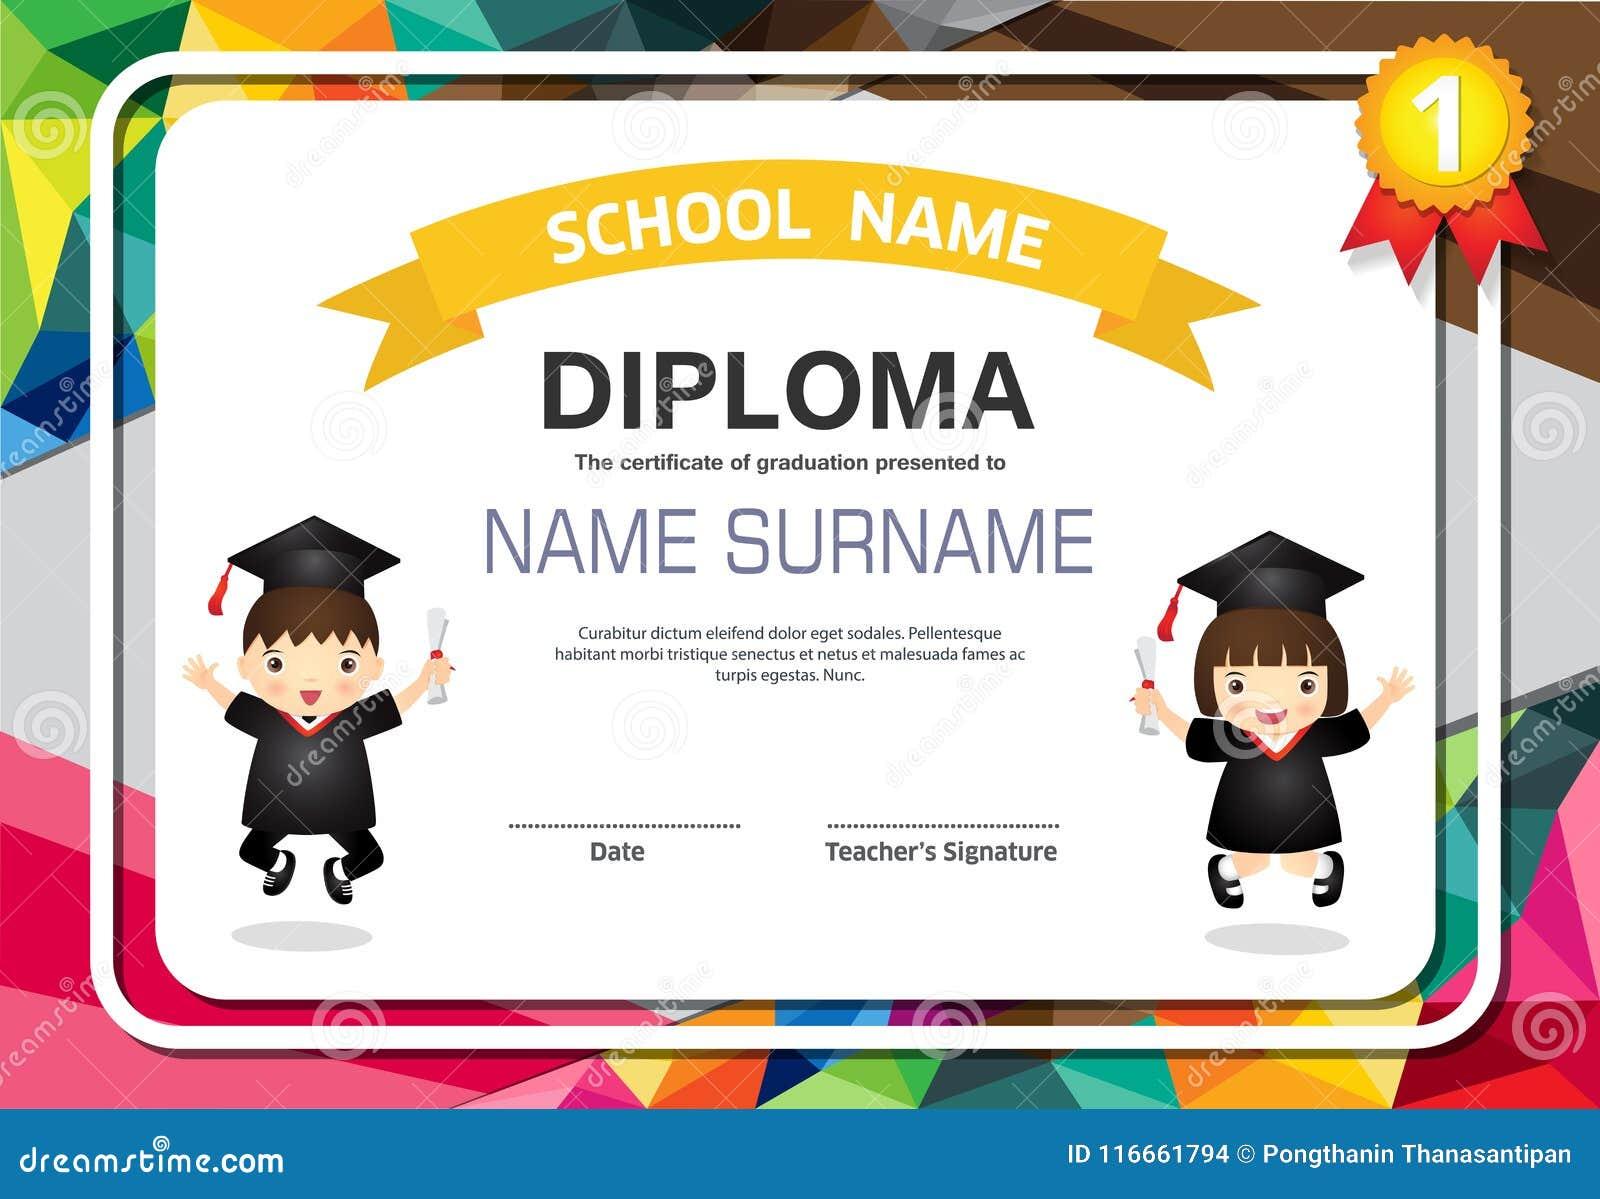 preschool kids diploma certificate colorful background design